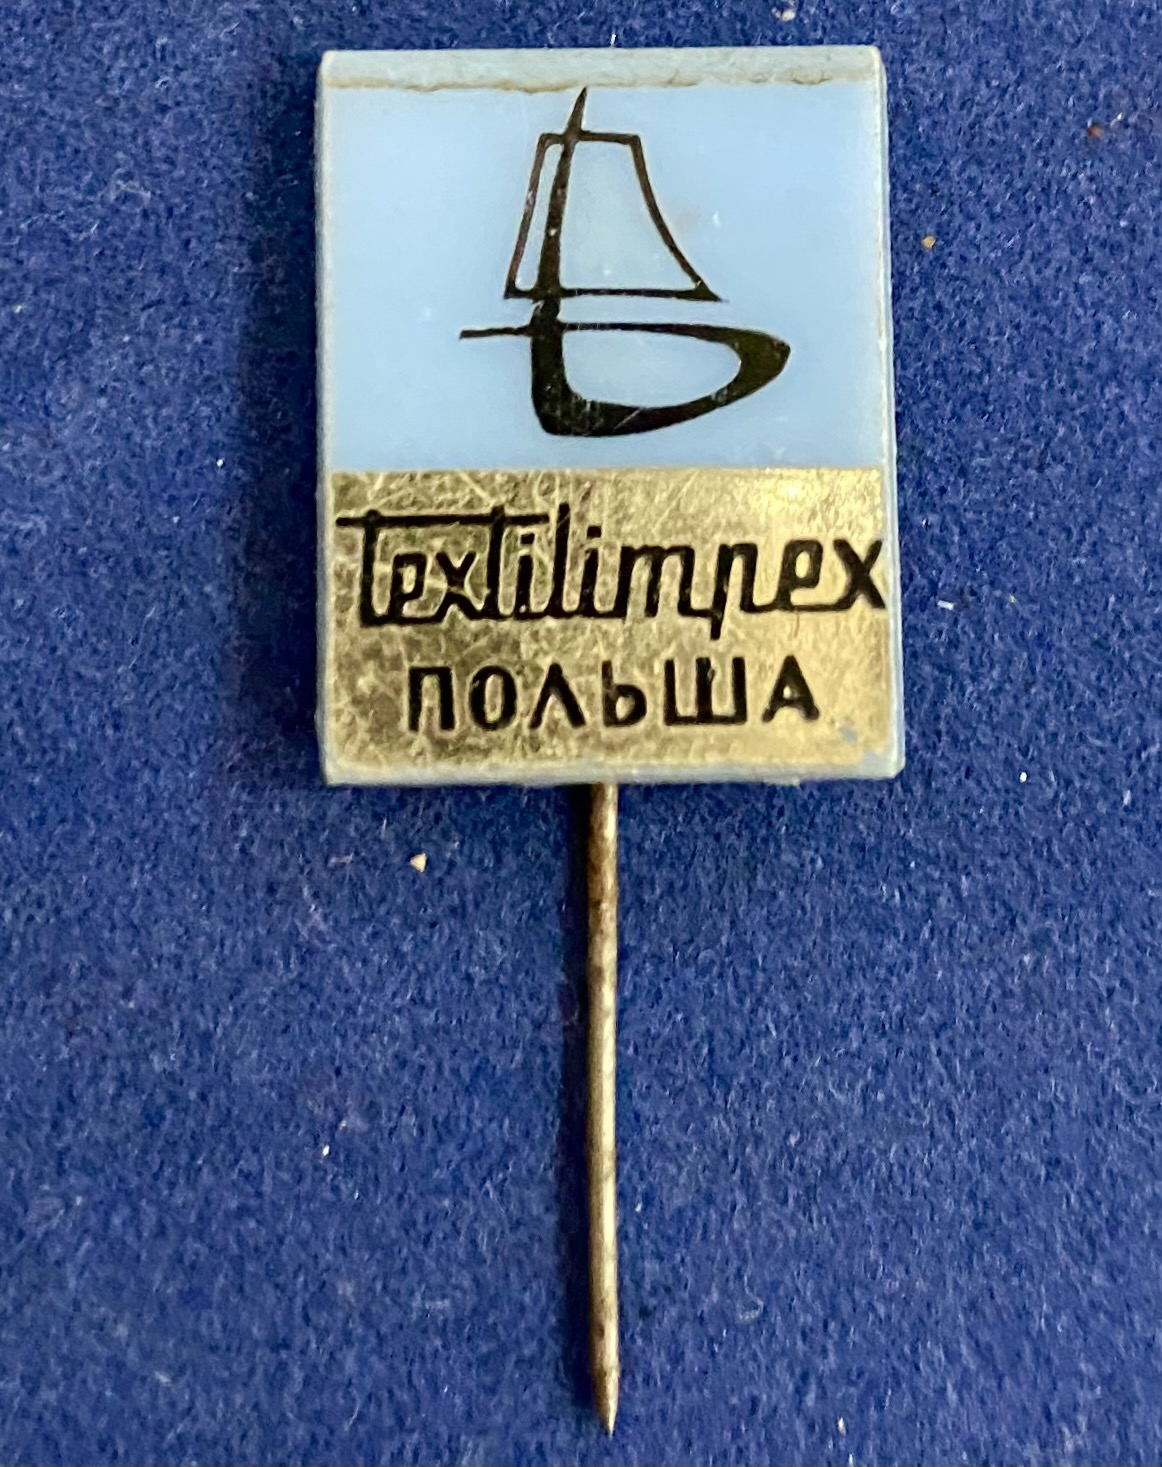 Значок на иголке Textilimpex Польша